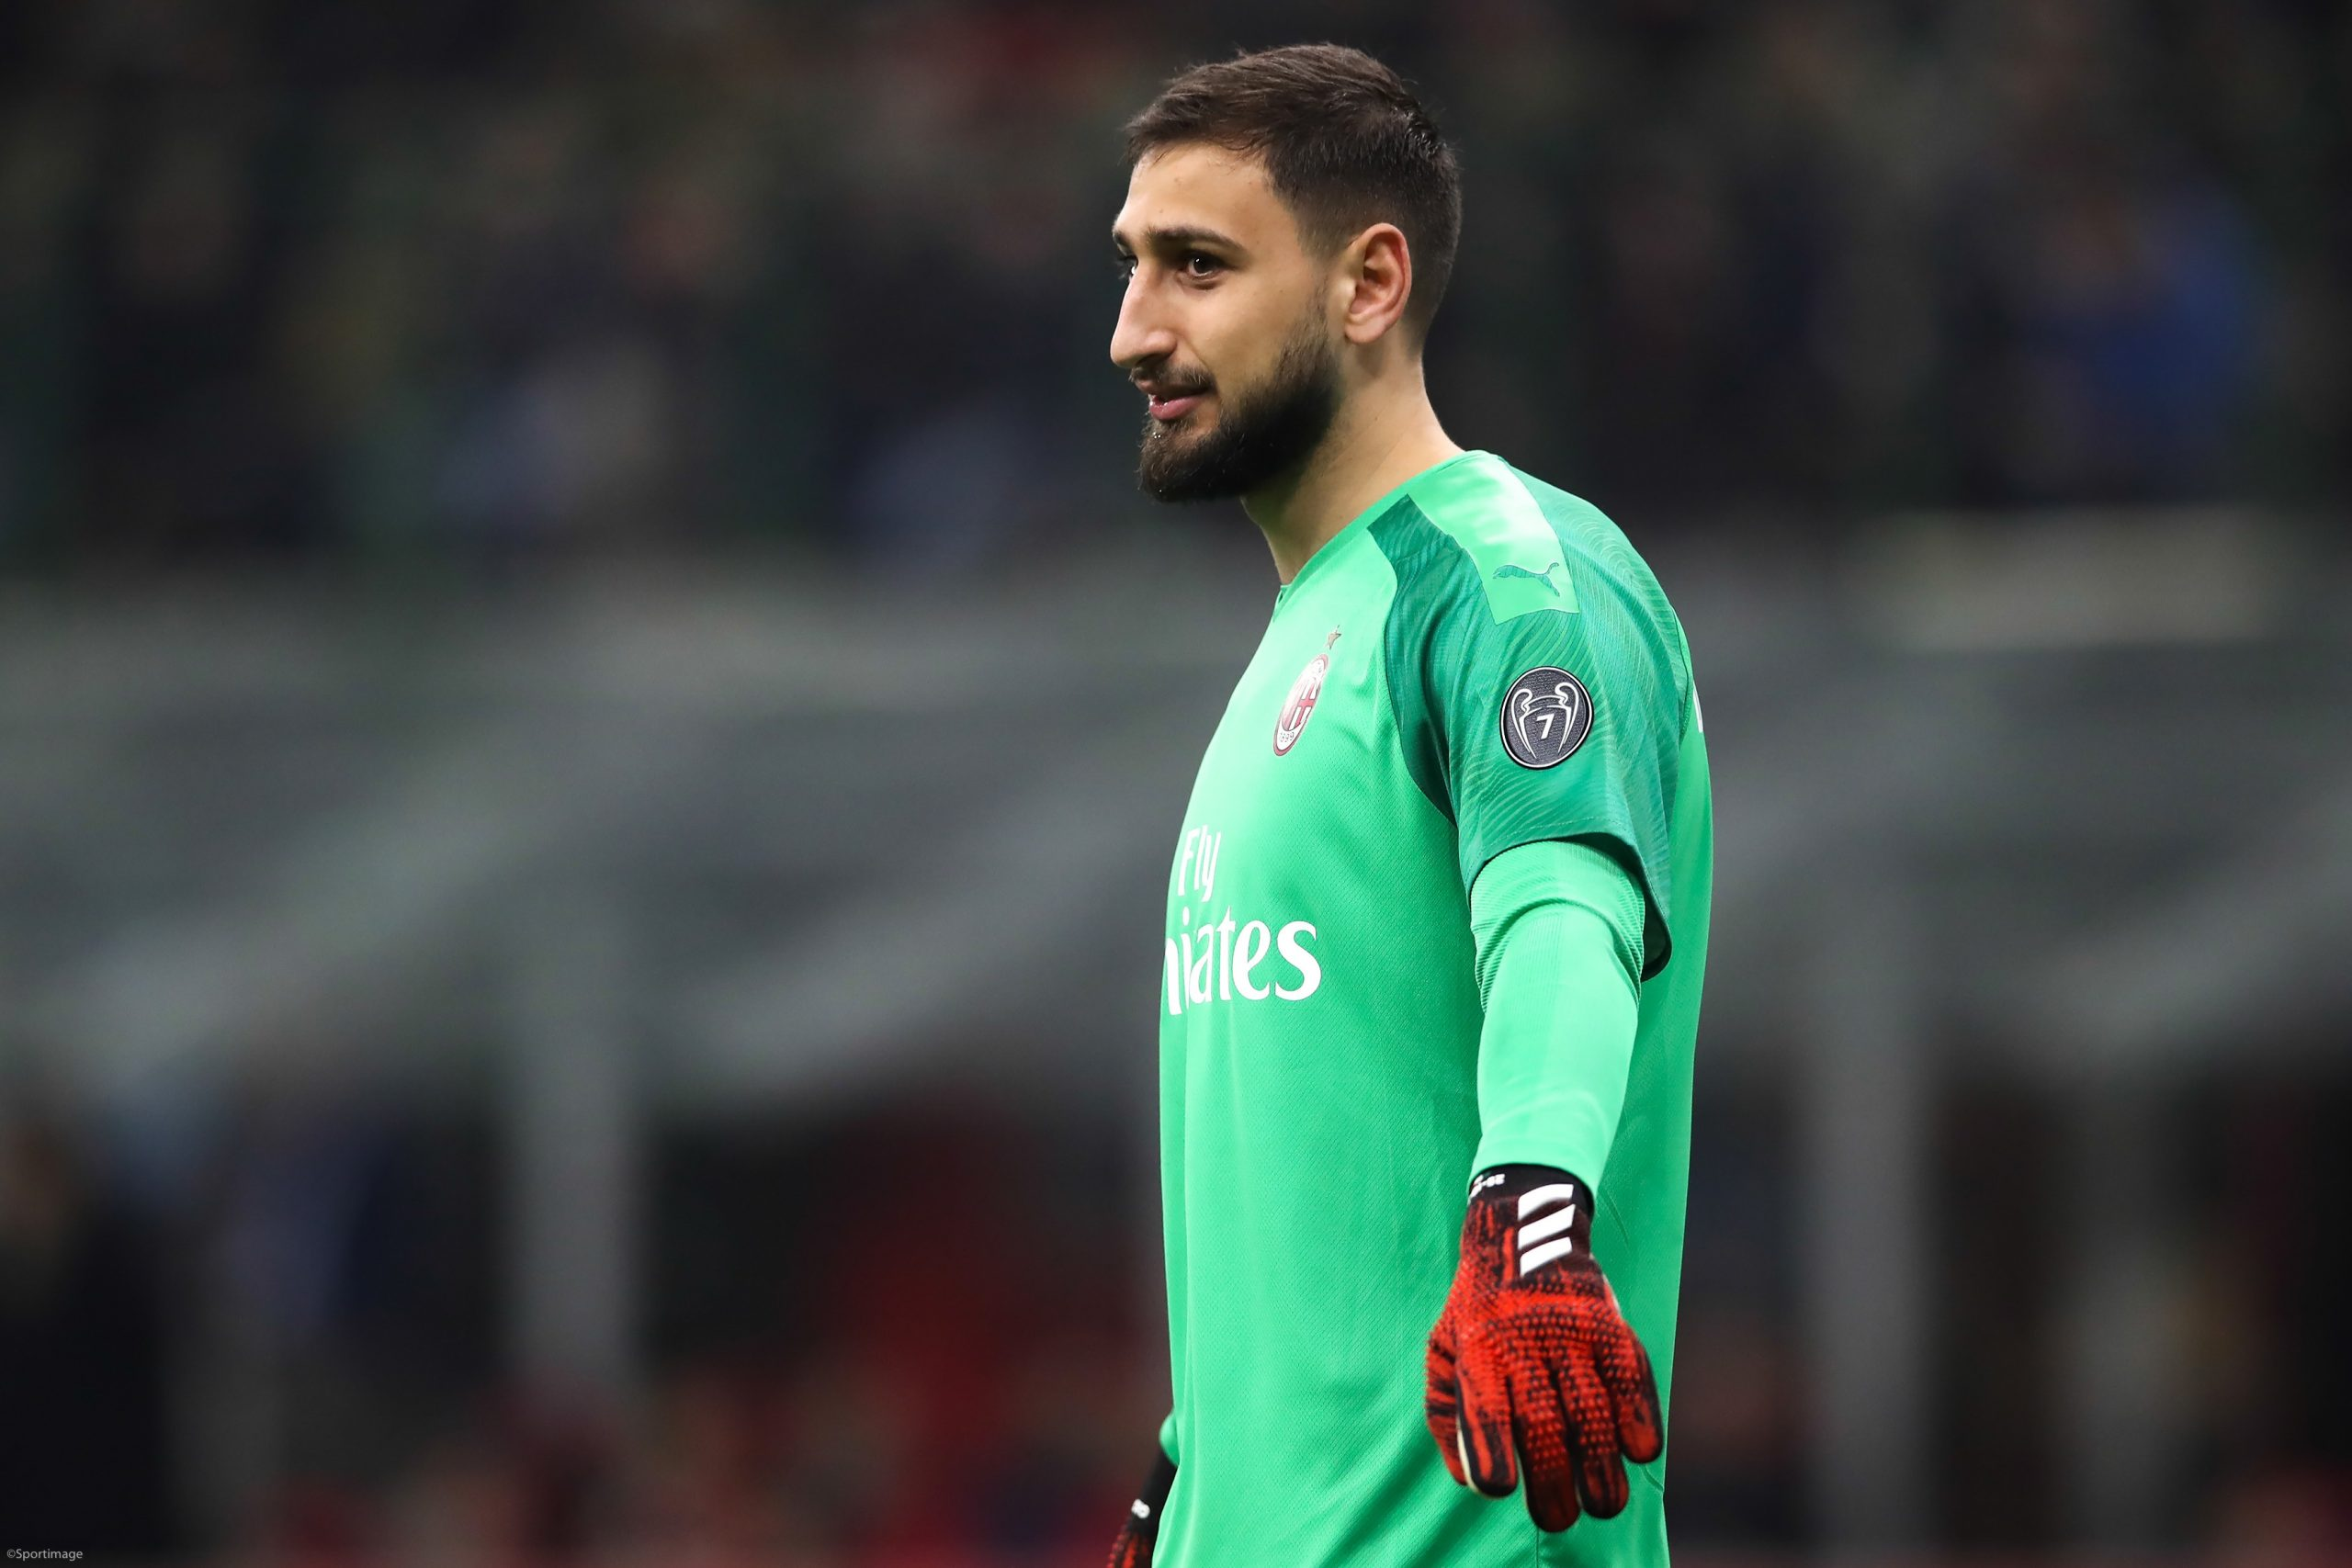 Mercato - Donnarumma loin d'une prolongation, le PSG le veut libre en 2021 selon La Gazzetta dello Sport